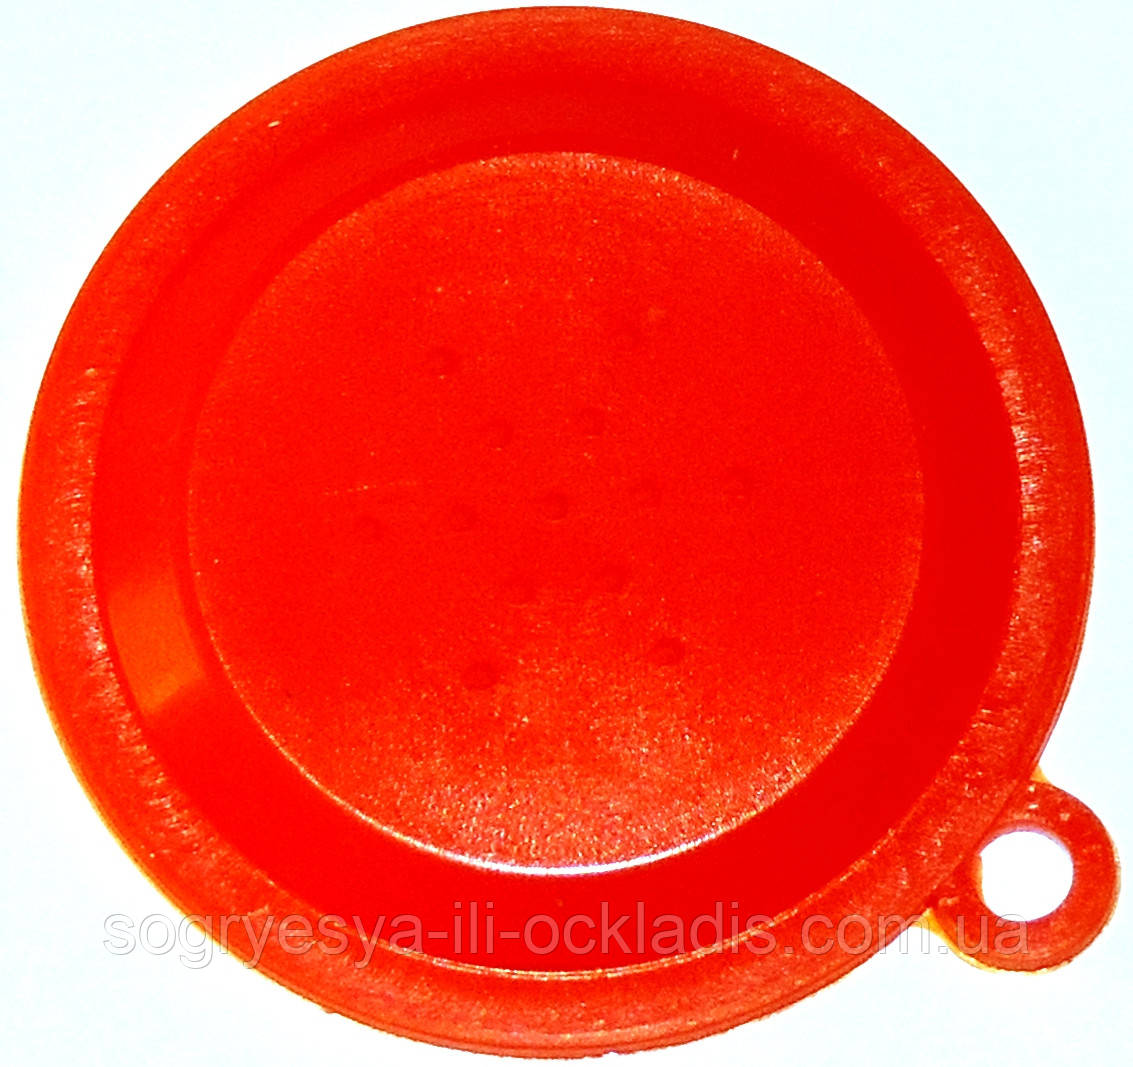 Мембрана 45 мм (силикон, красная, без фирм. упаковки, Италия) клапана Fugas, артикул 70101002, код сайта 0504